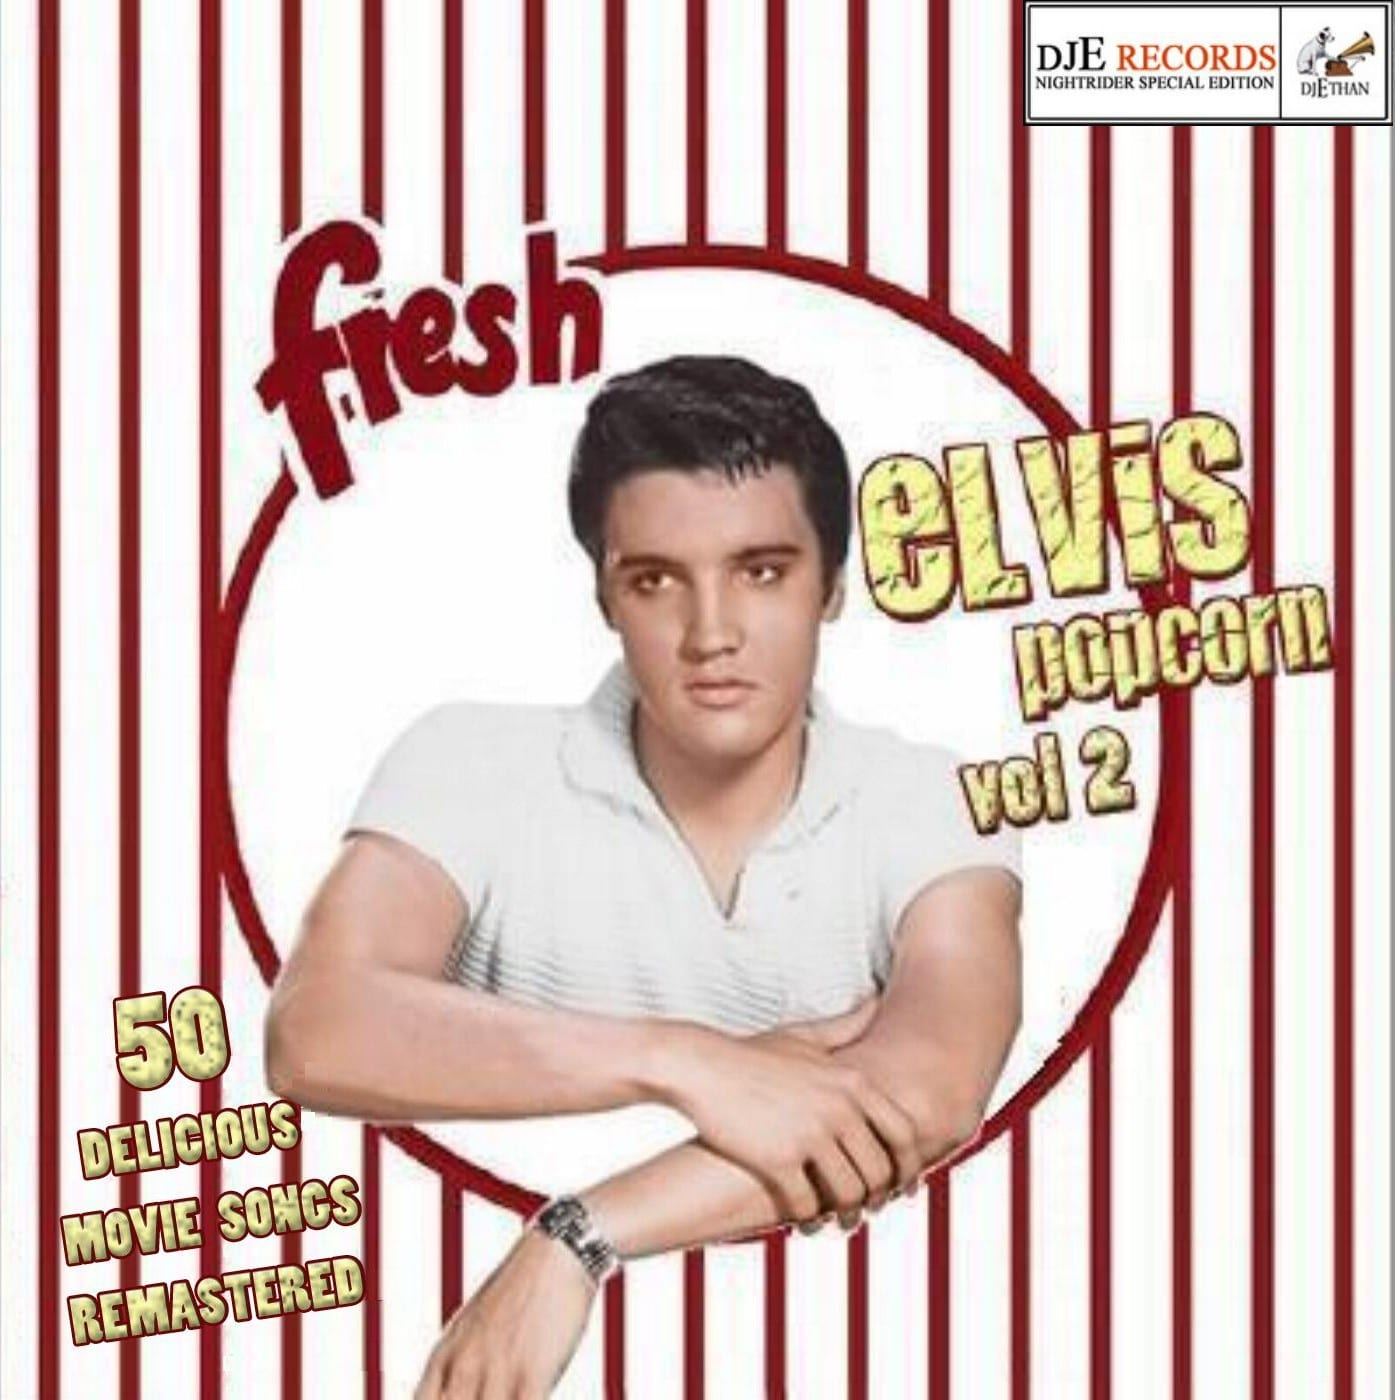 Elvis Presley - Popcorn, Vol. 1 (2008) 2 CD SET 8